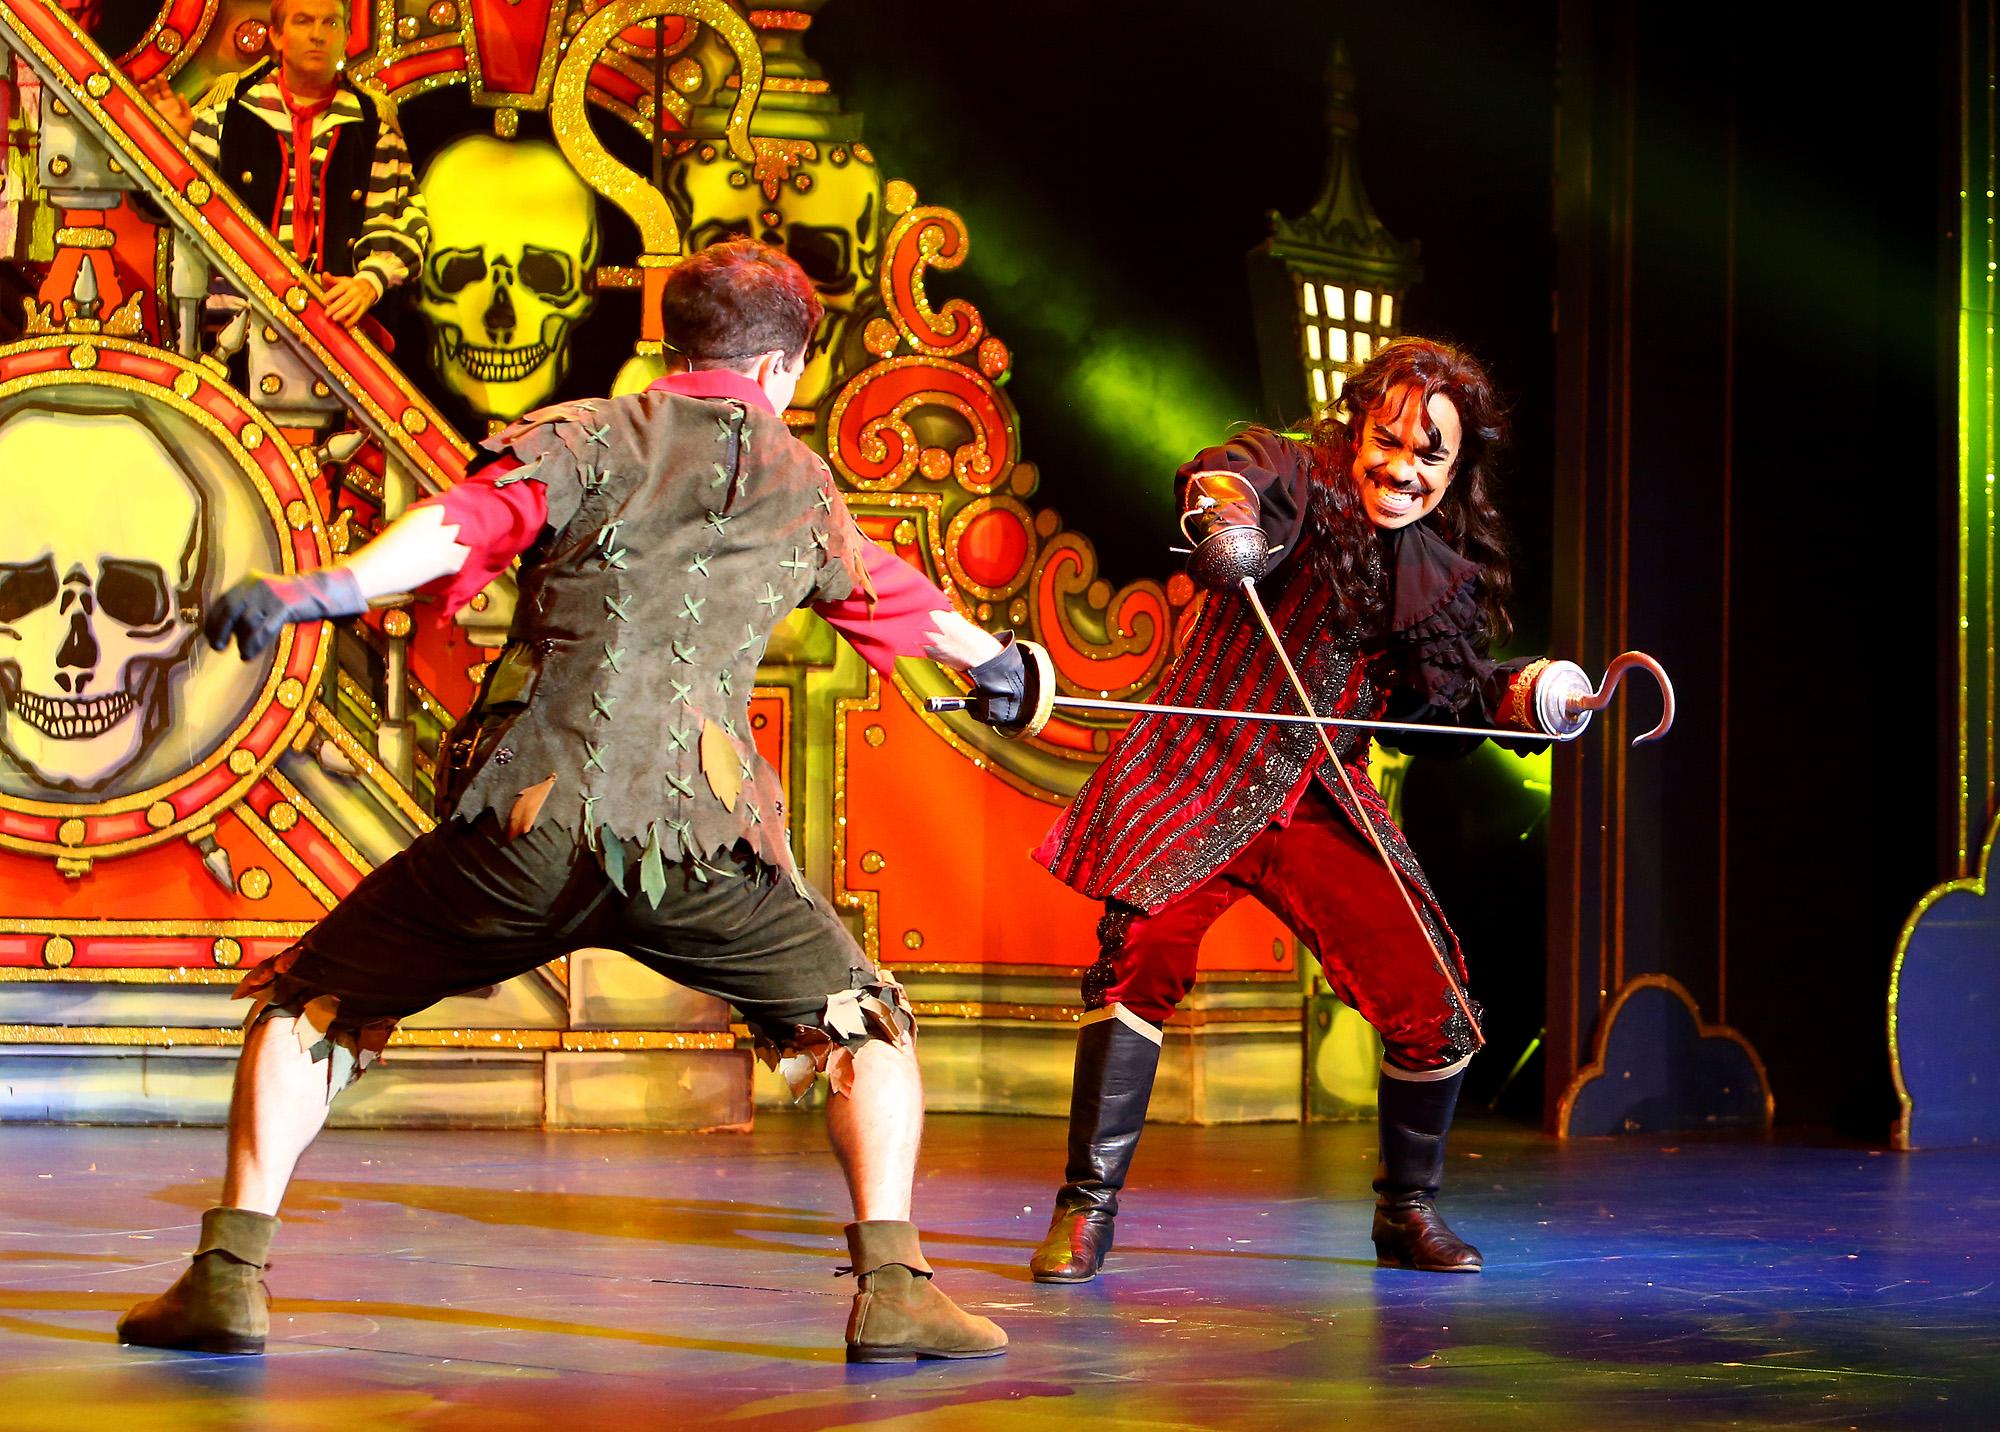 Peter Pan. George Ure as Peter Pan and David Bedella as Captain Hook in 'Peter Pan' at Milton Keynes Theatre, Christmas 2014.